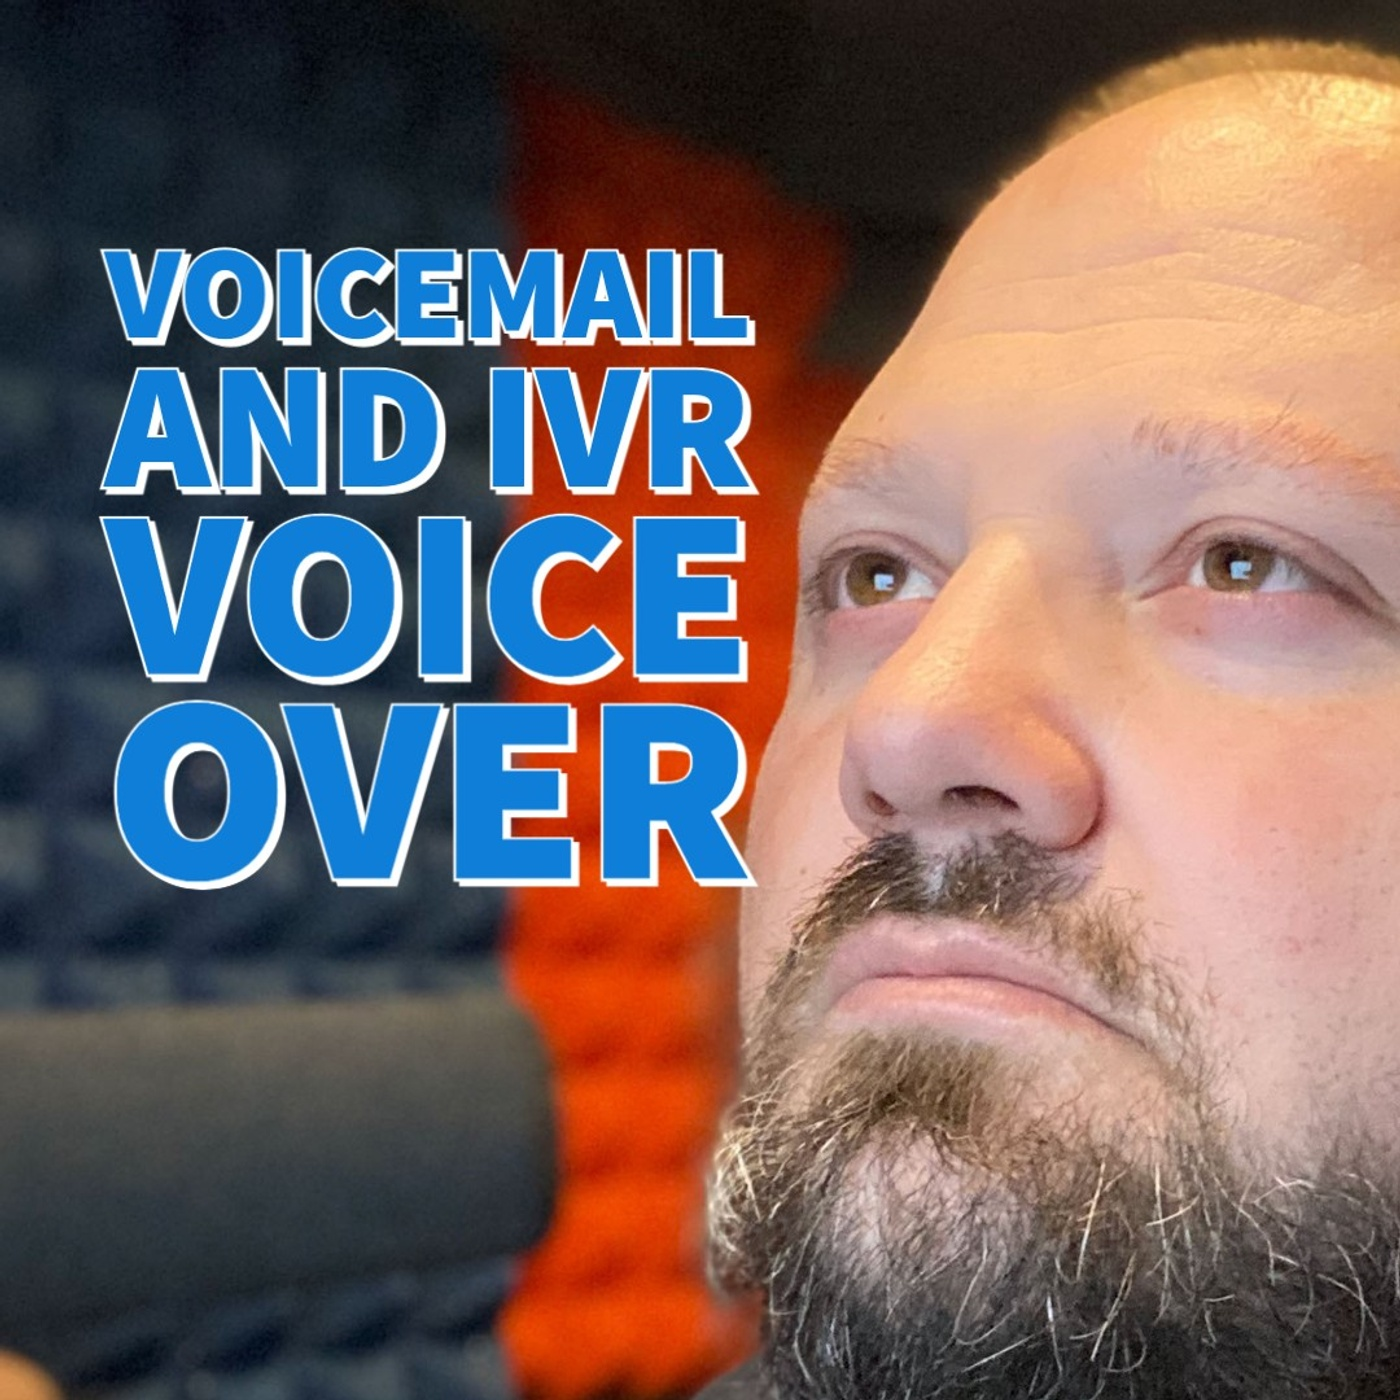 Kqtzmkhdr7uxnbayxa1j movie trailer voice over copy 3